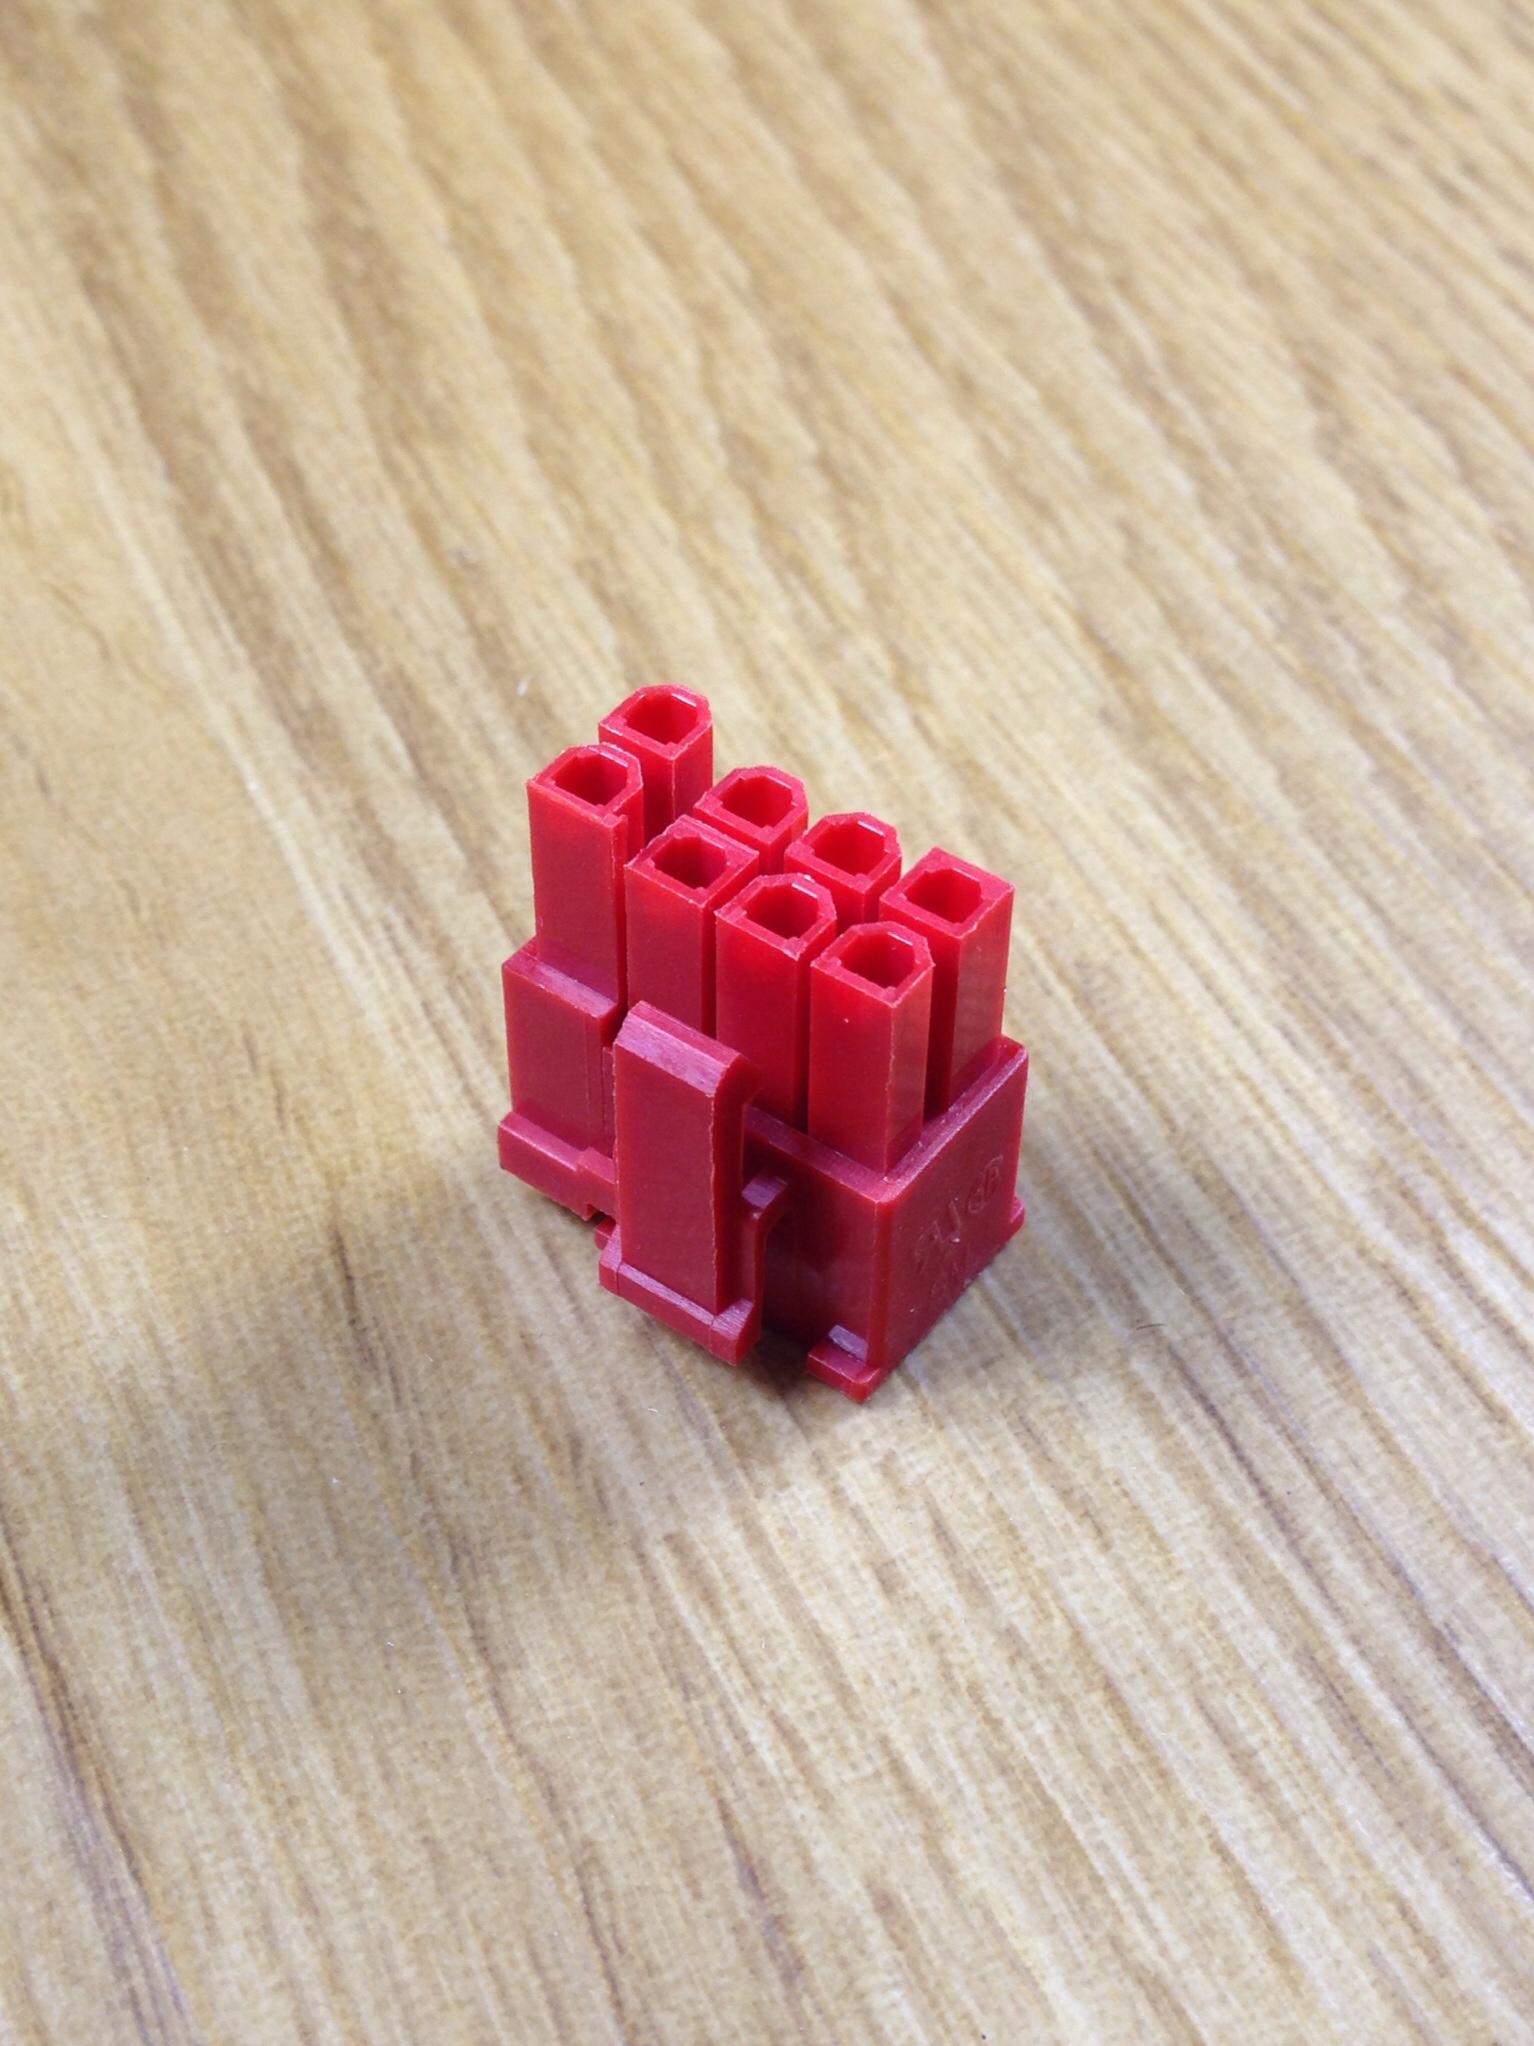 Connector 6+2 Pin VGA สีแดง